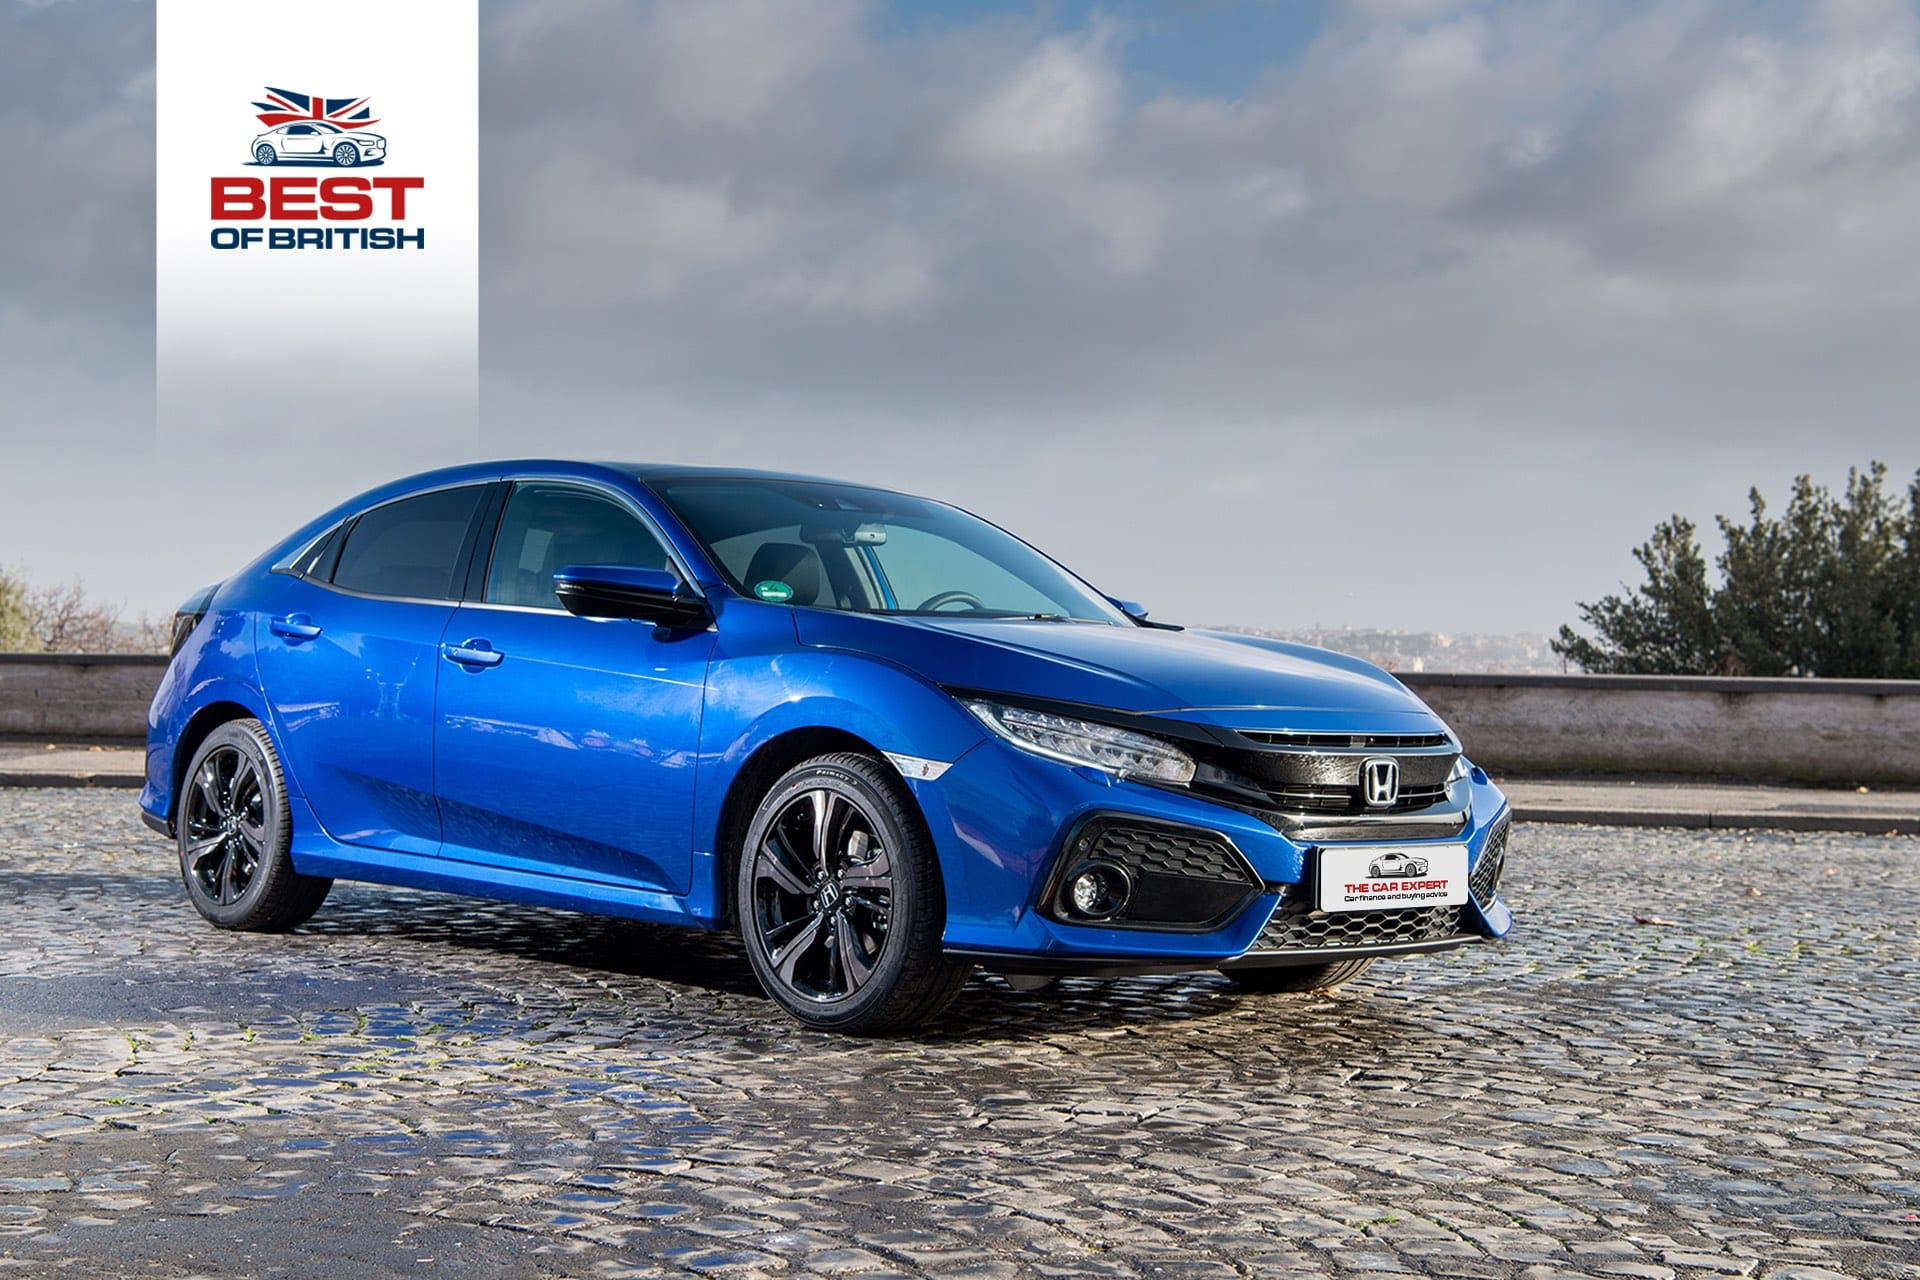 Honda Civic diesel on test at The Car Expert